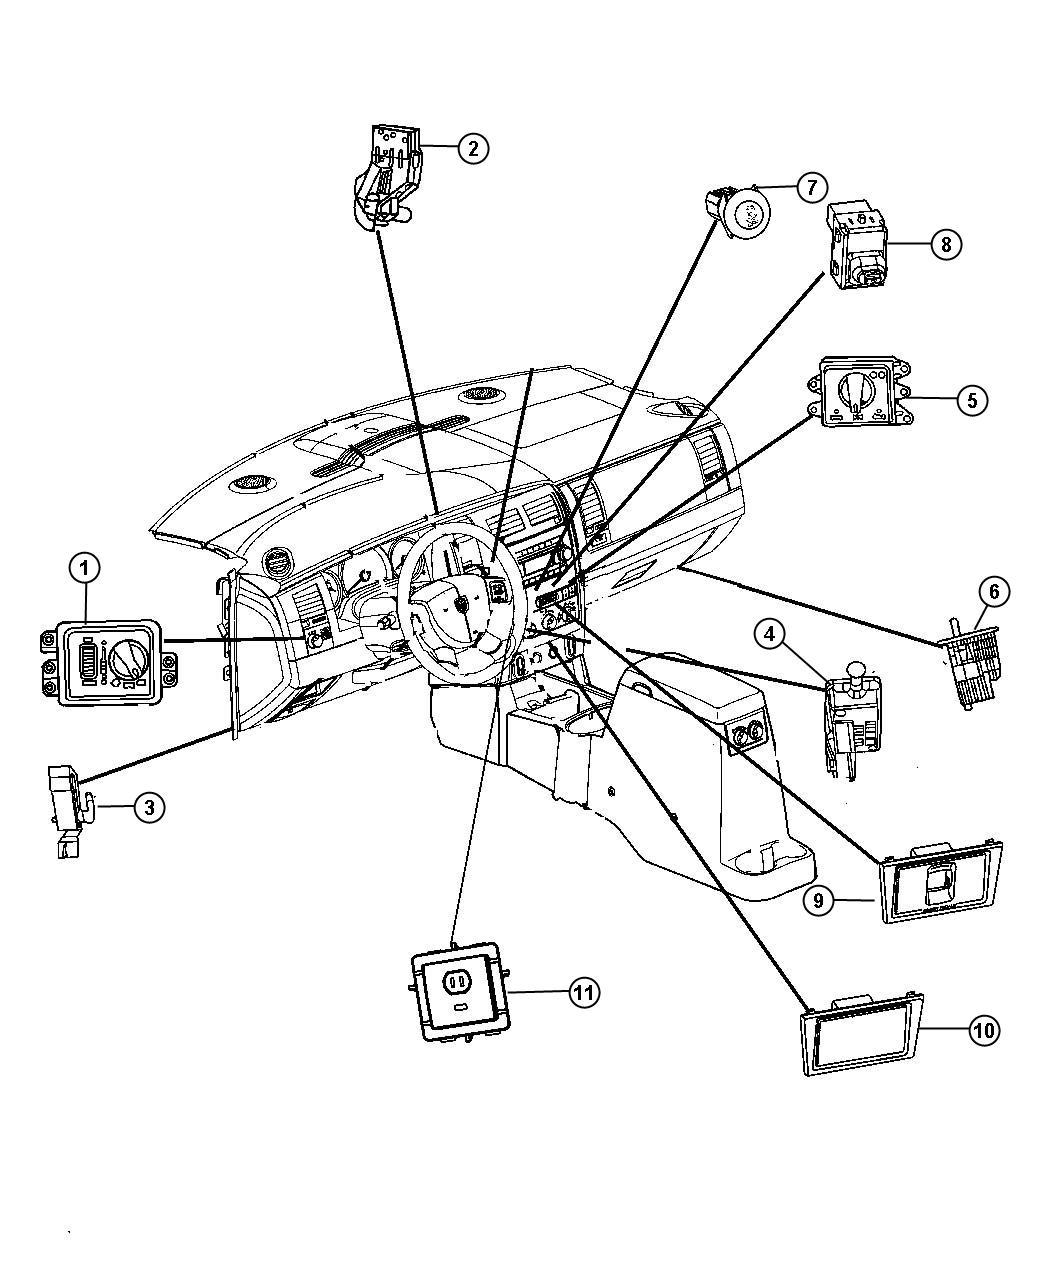 2004 dodge durango engine wiring harness